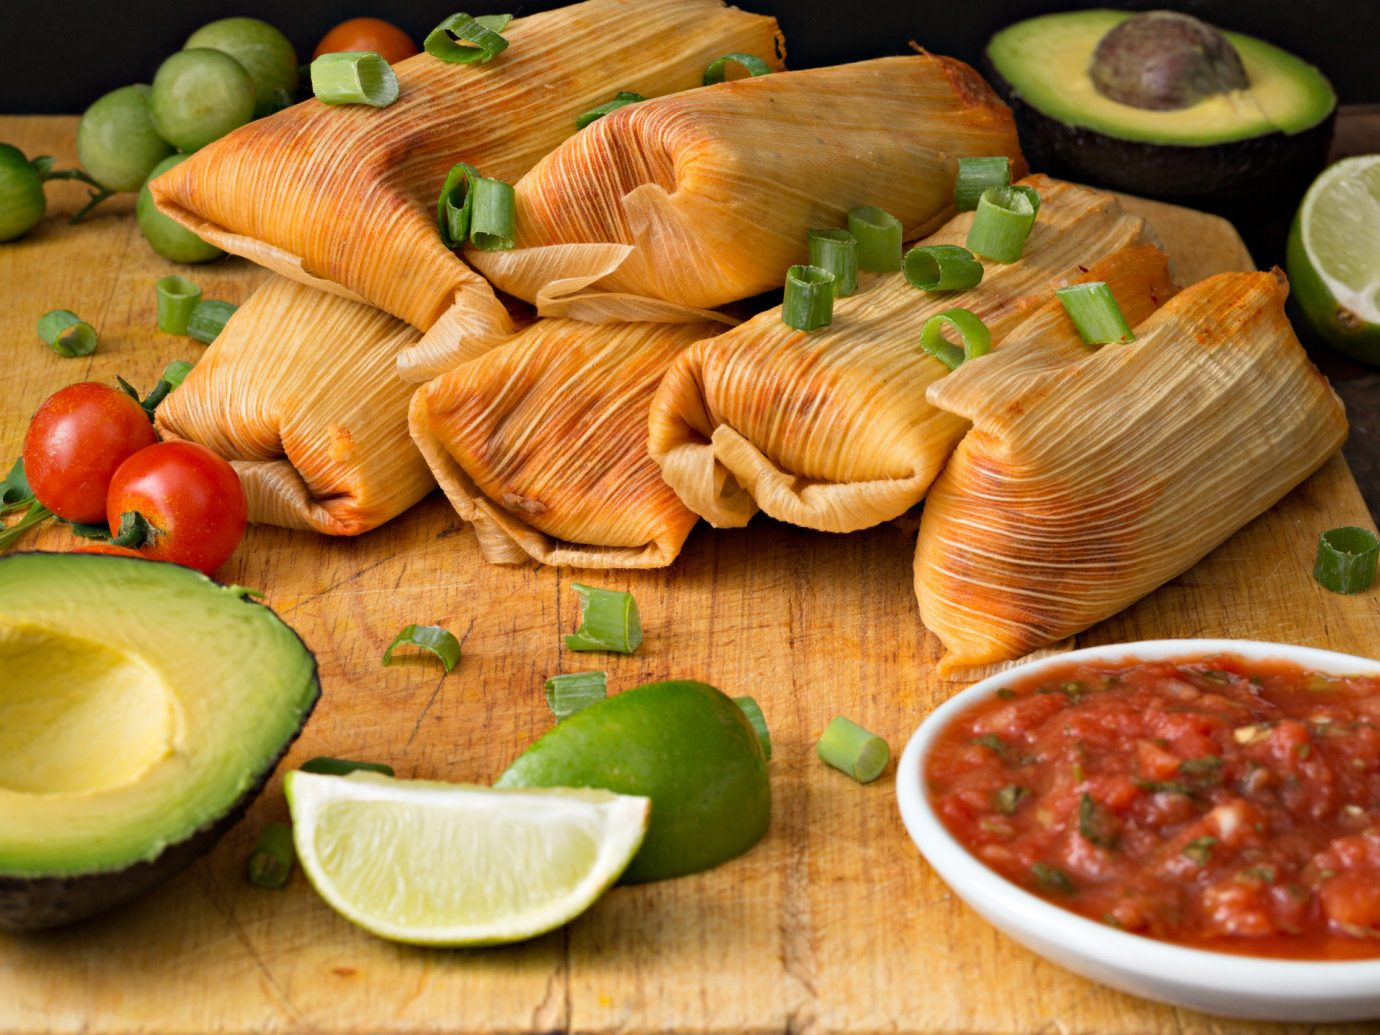 Food + Drink food dish board produce wooden cuisine fish meal vegetable sliced wood several